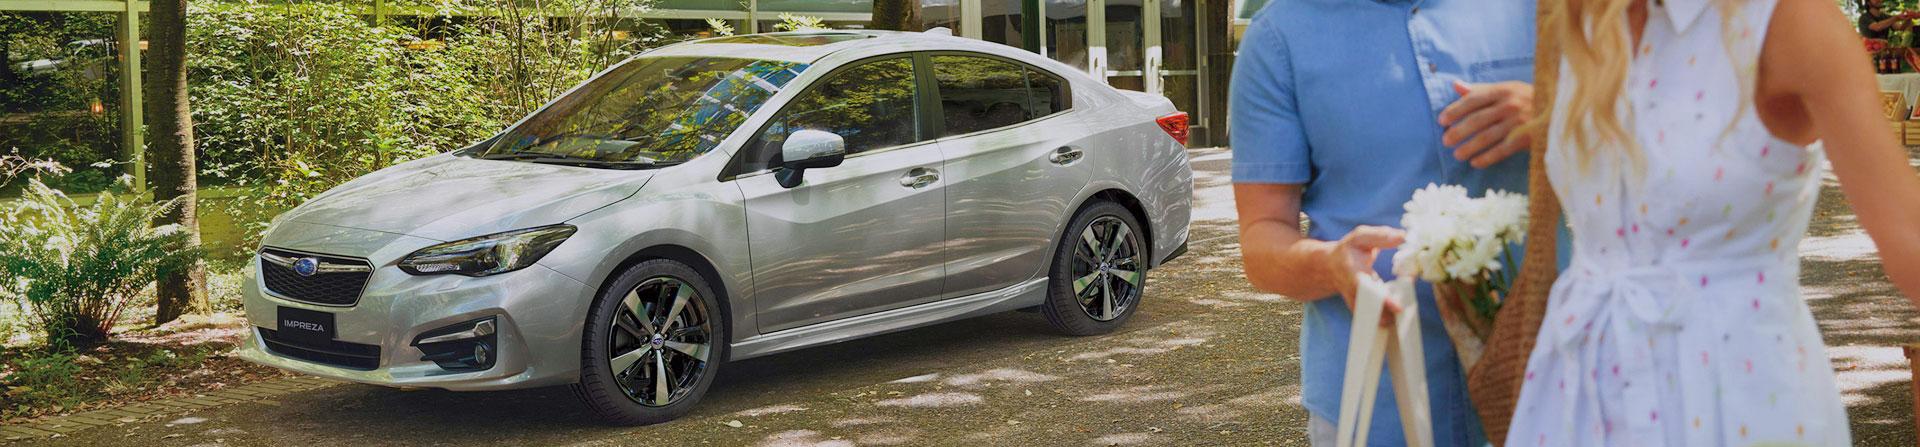 Subaru Impreza Image 6